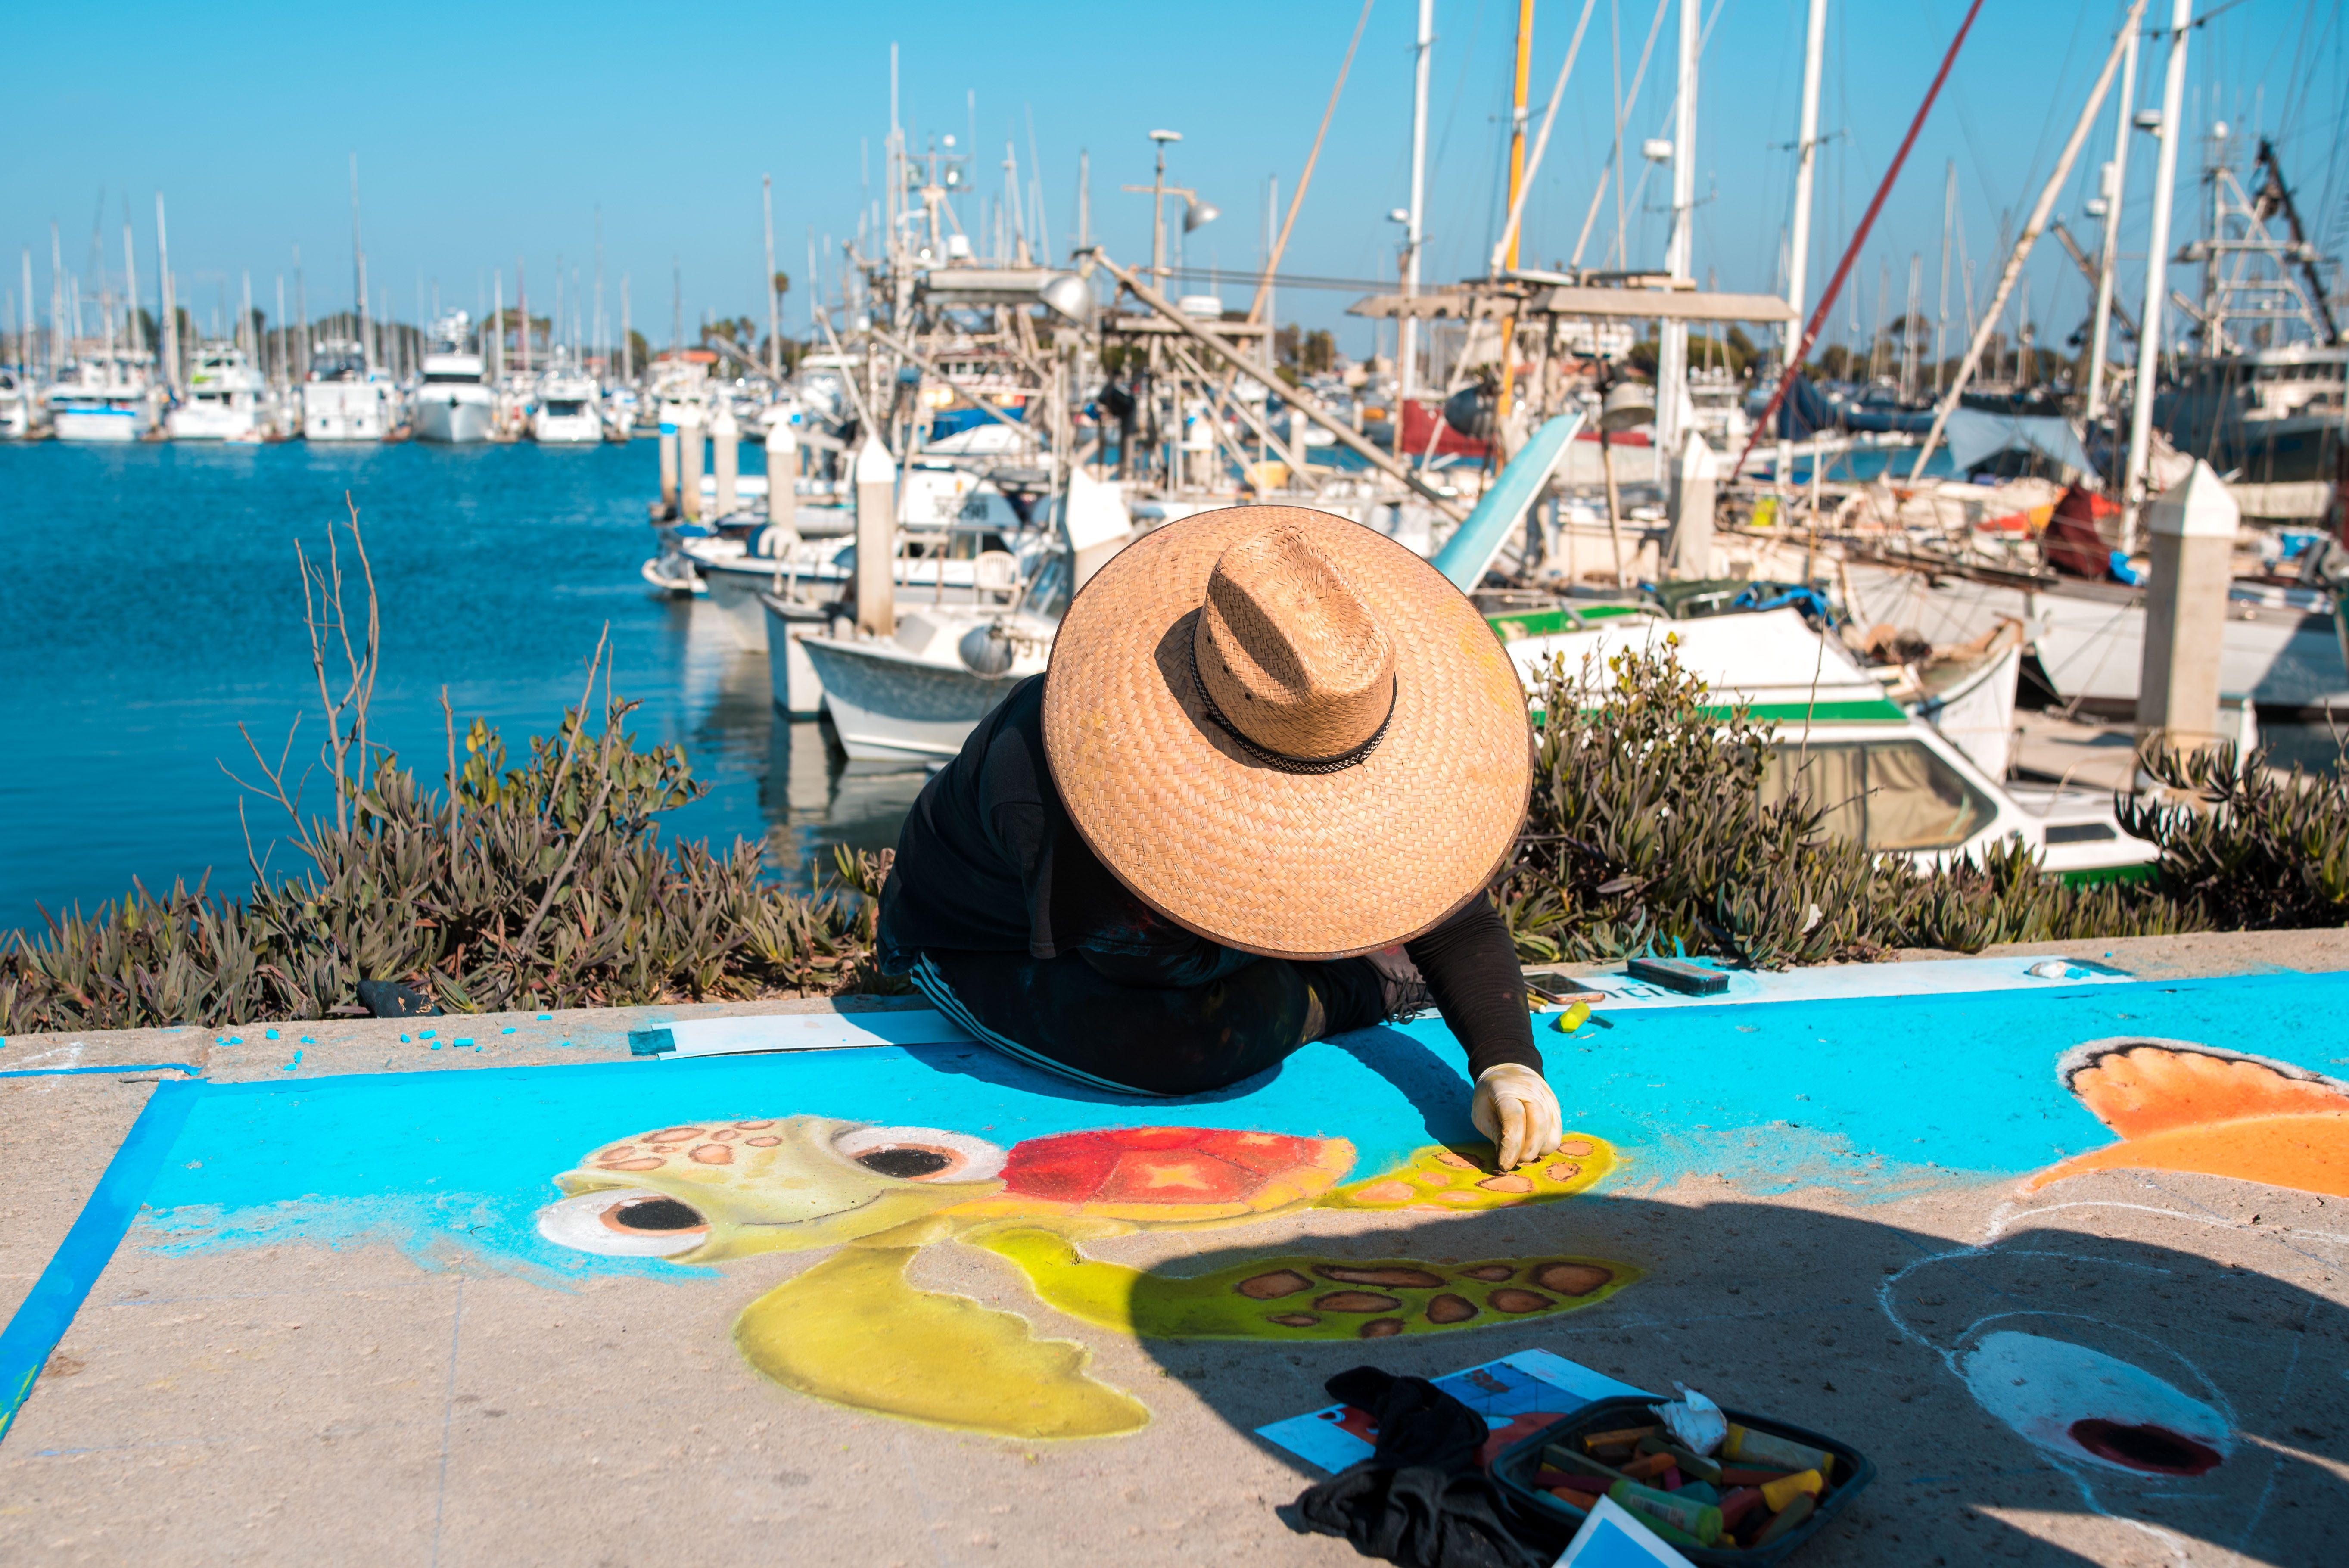 chalk artist at work on ventura harbors waterfront promenade